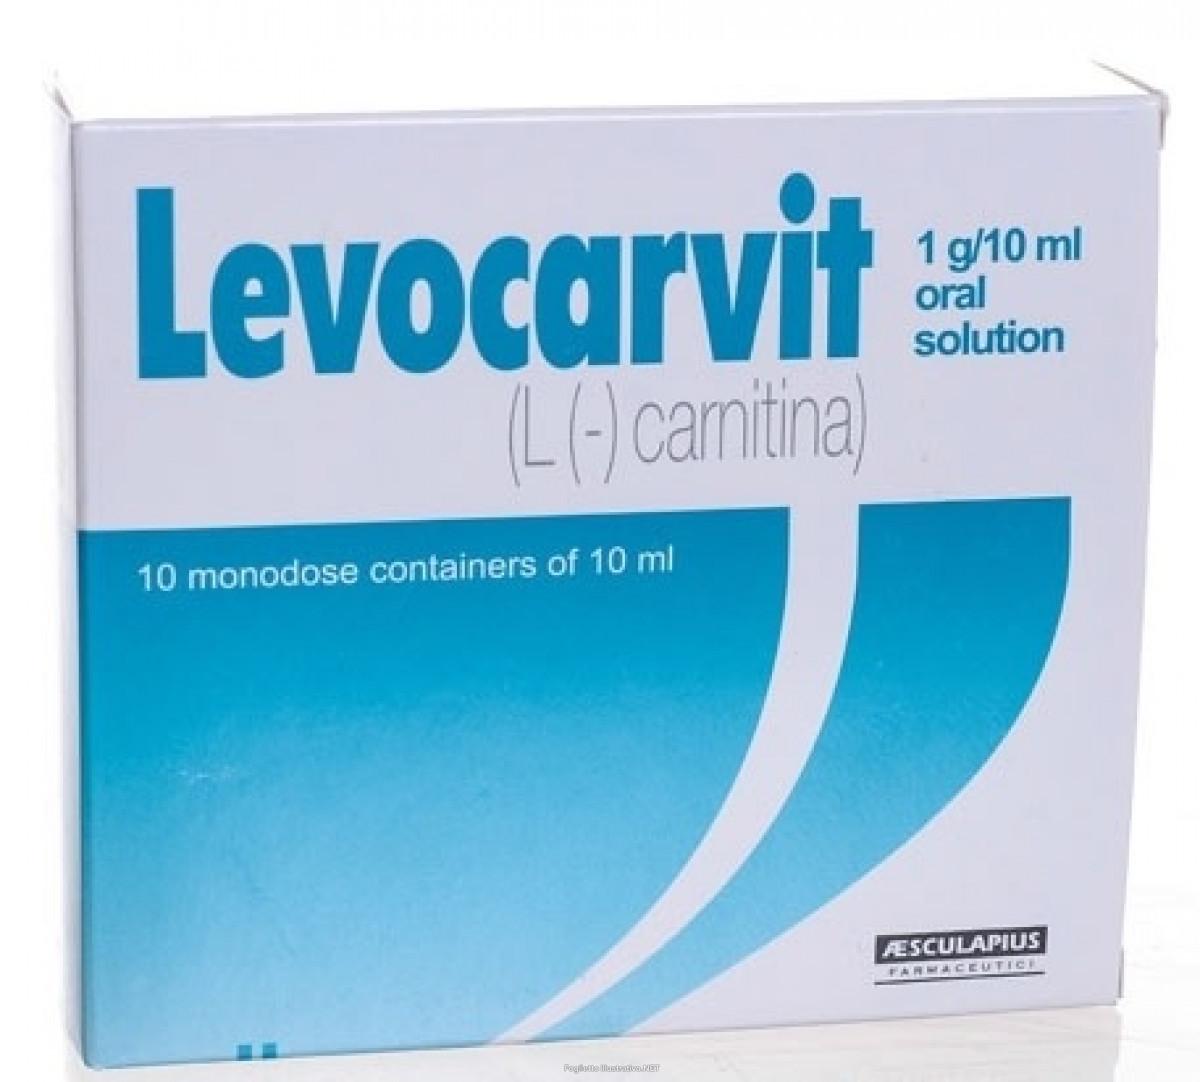 LEVOCARVIT (L-carnitin)